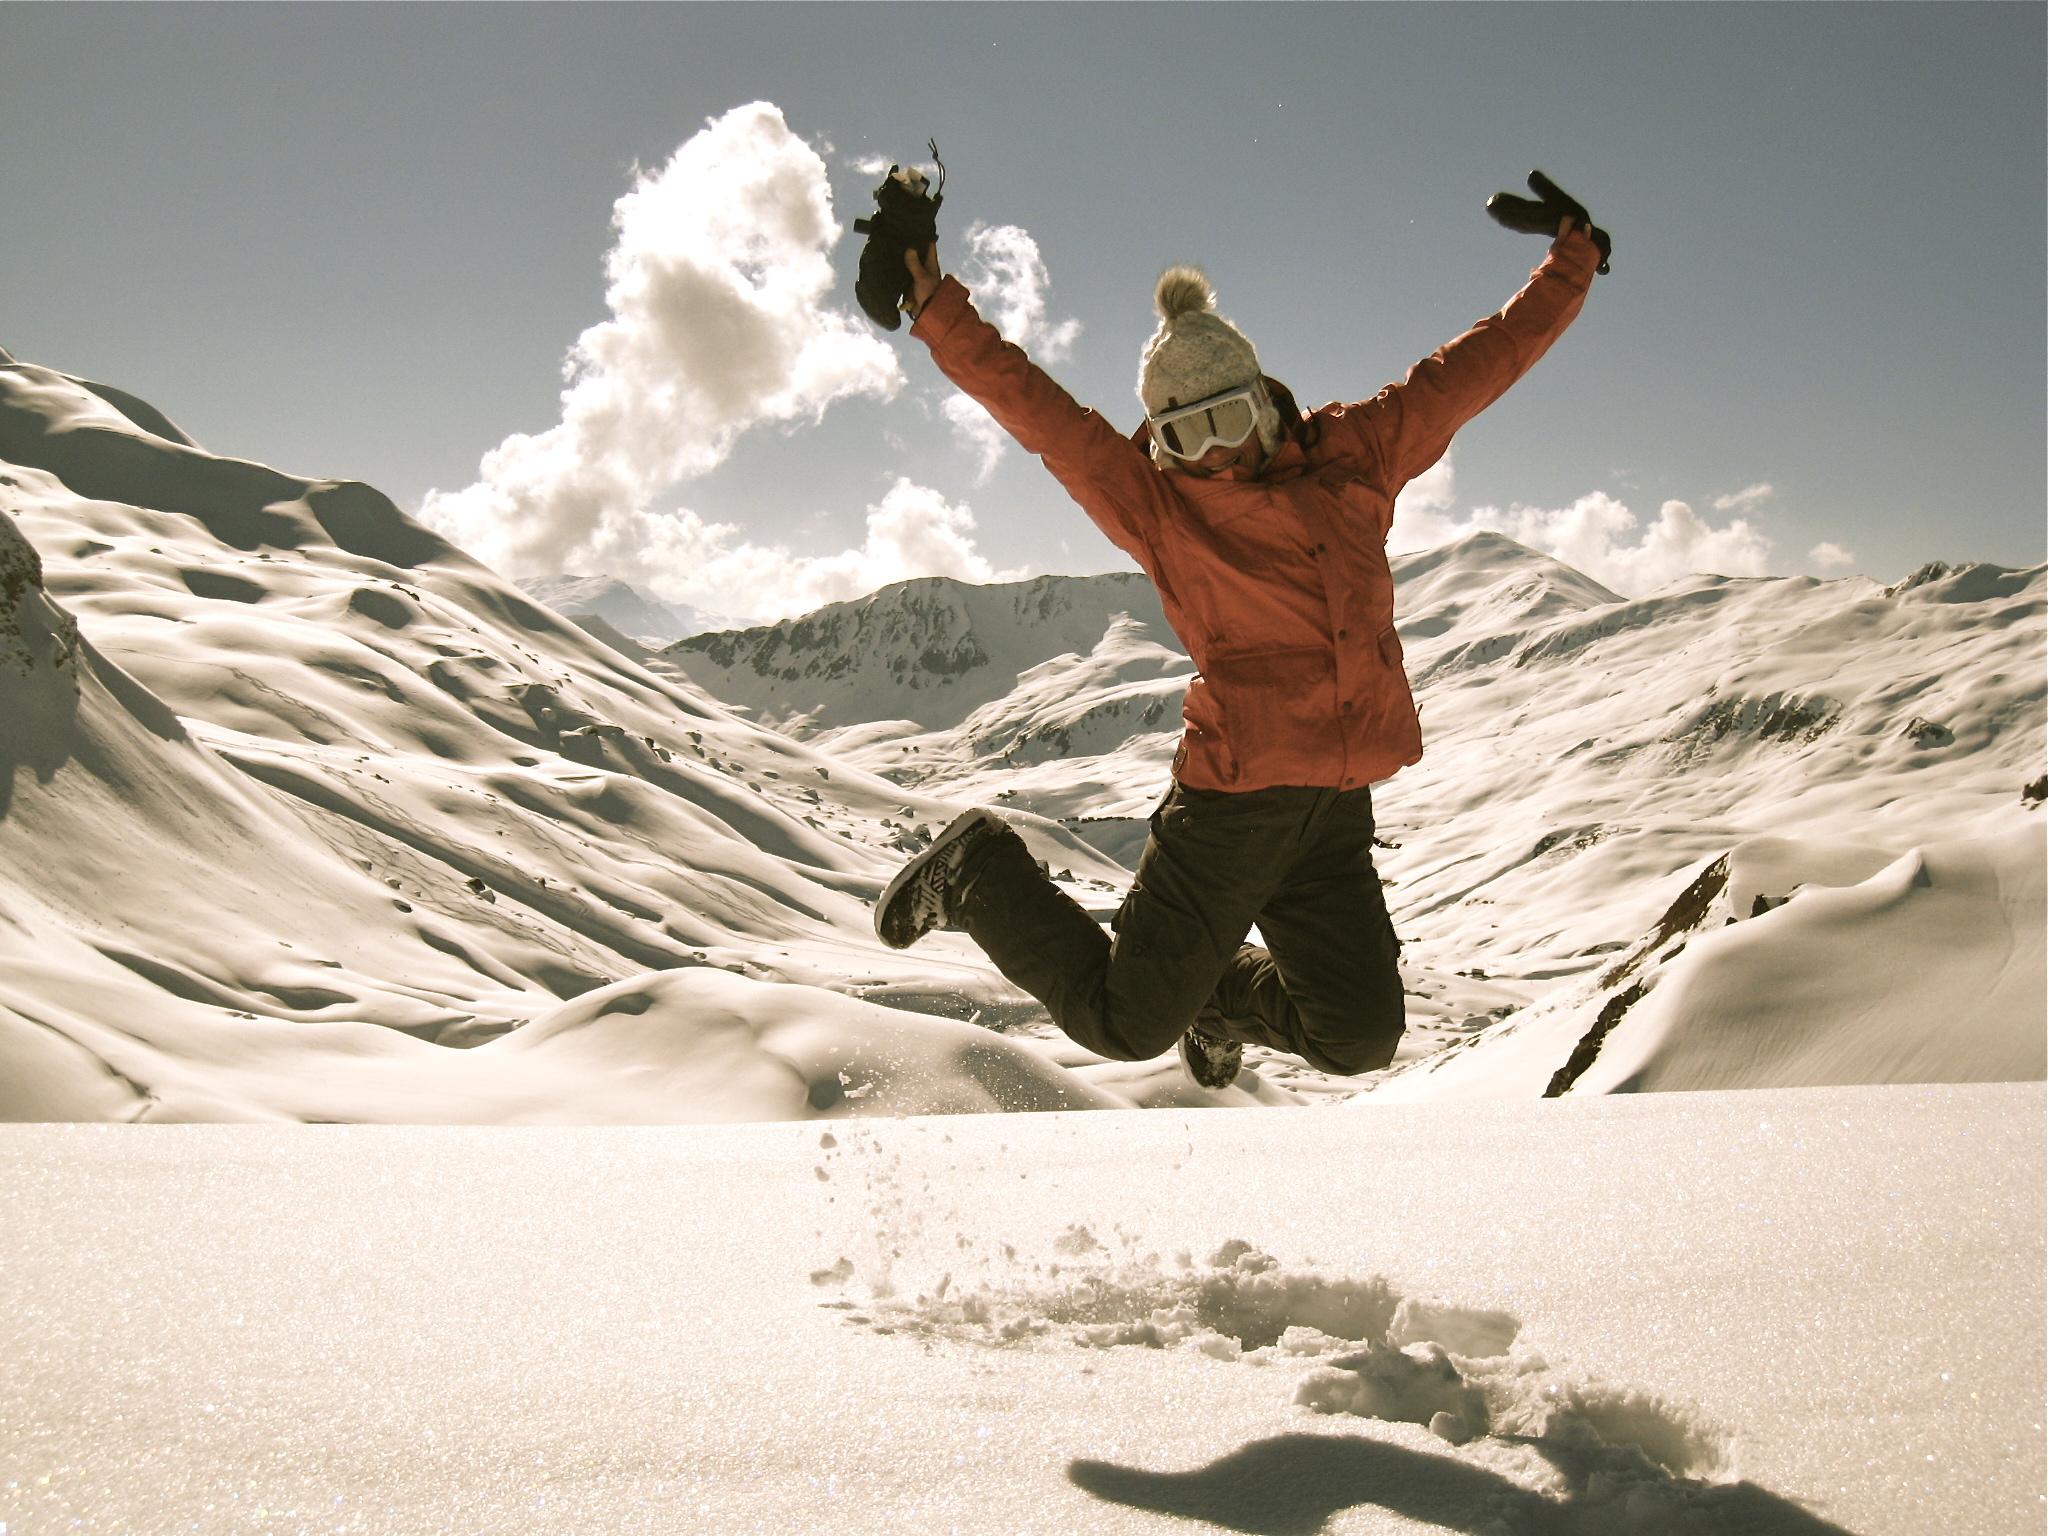 Korina Smyrek loving the winter months in the mountains of Switzerland.